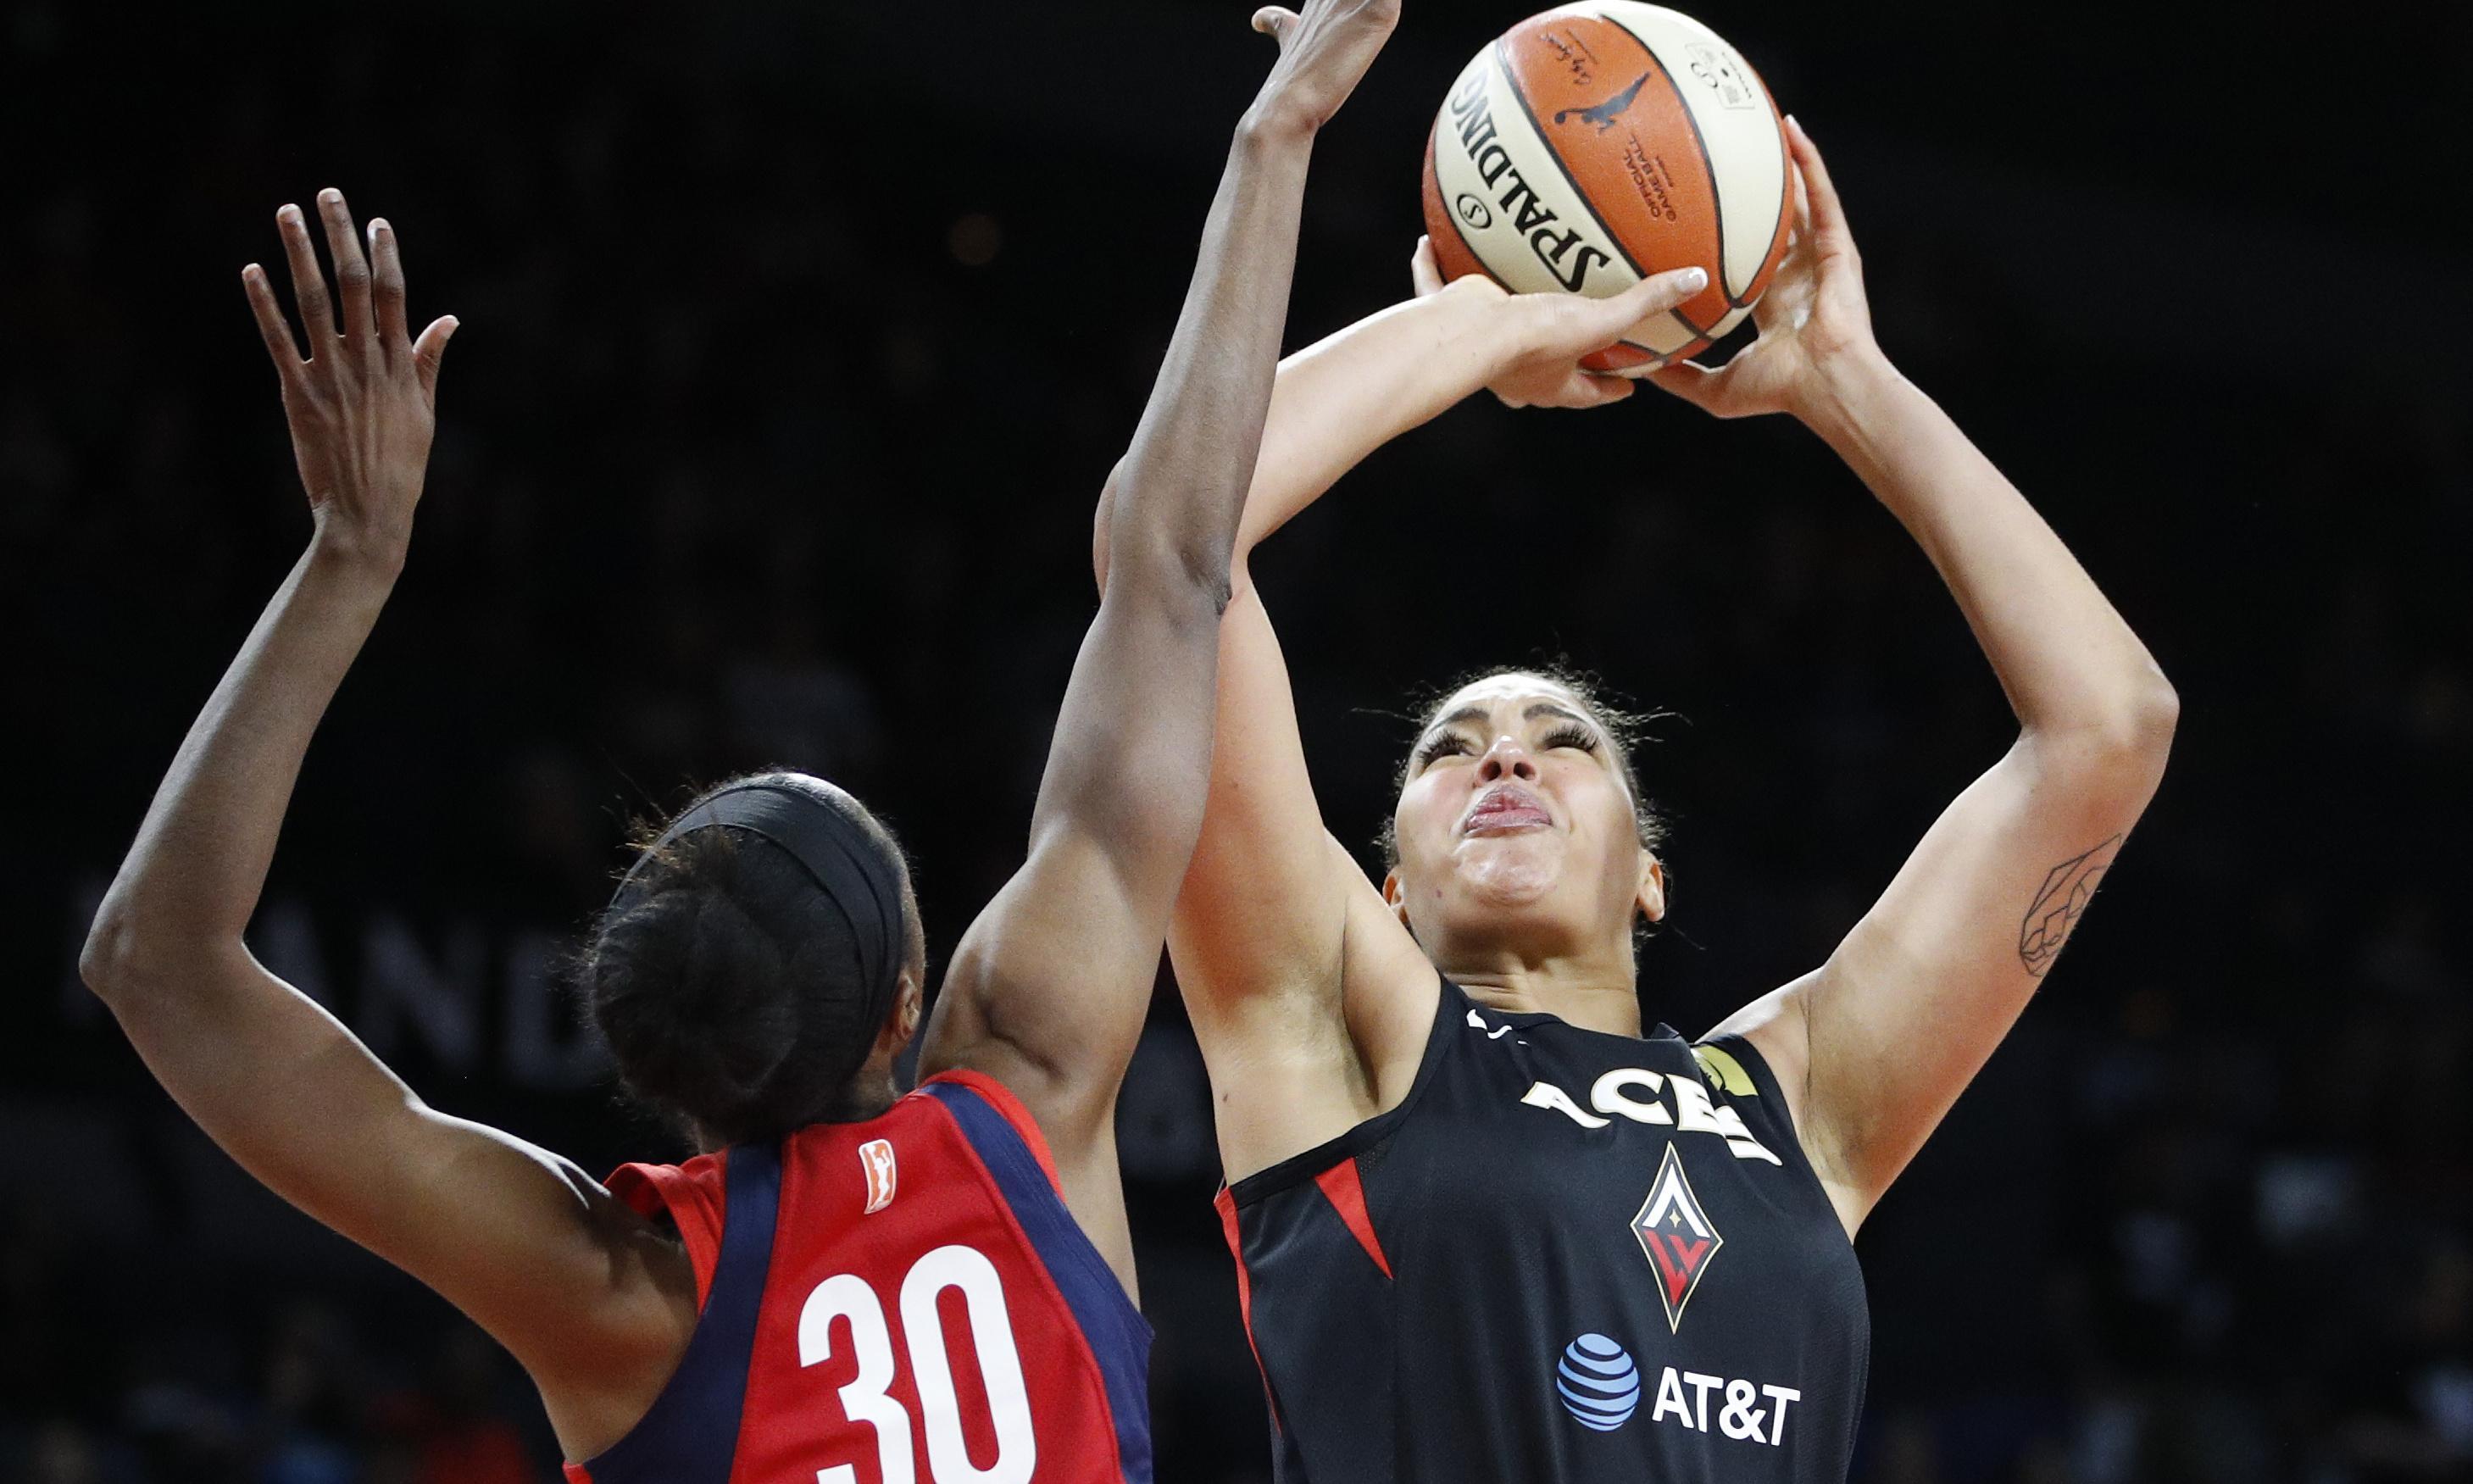 Liz Cambage mocks Mystics after WNBA play-offs win